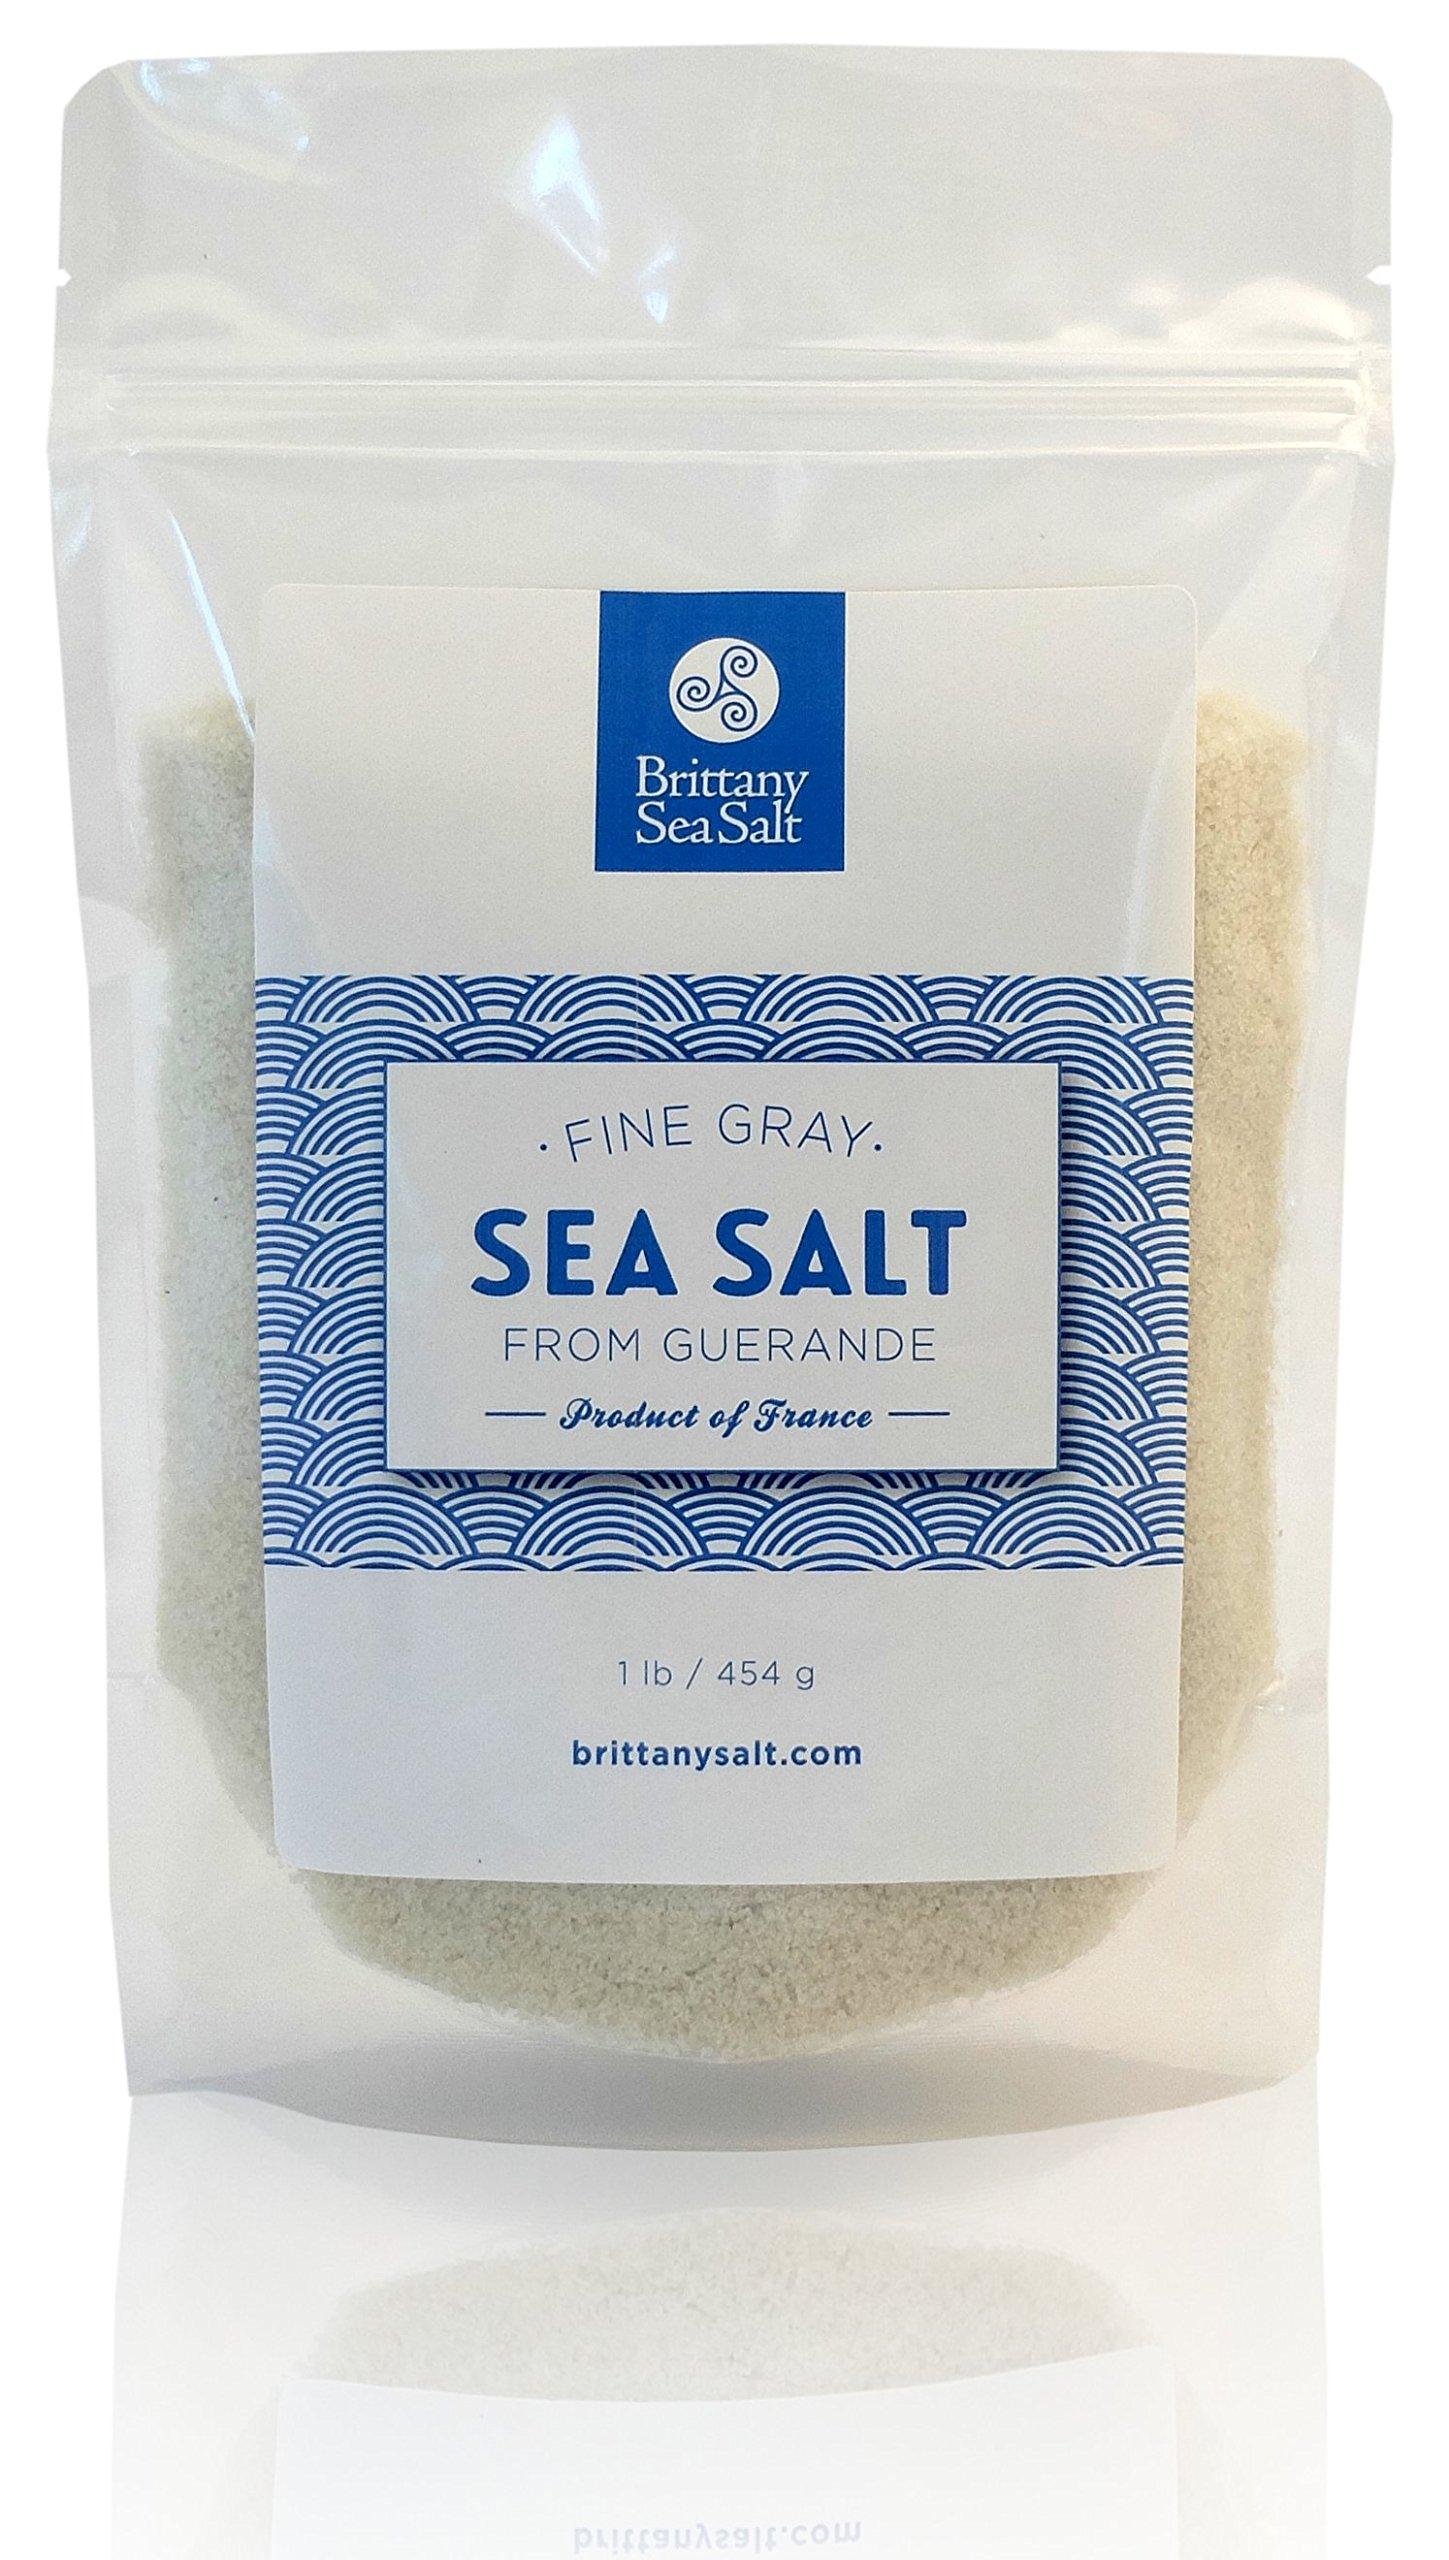 Fine Gray Sea Salt From Guérande 1 Lb